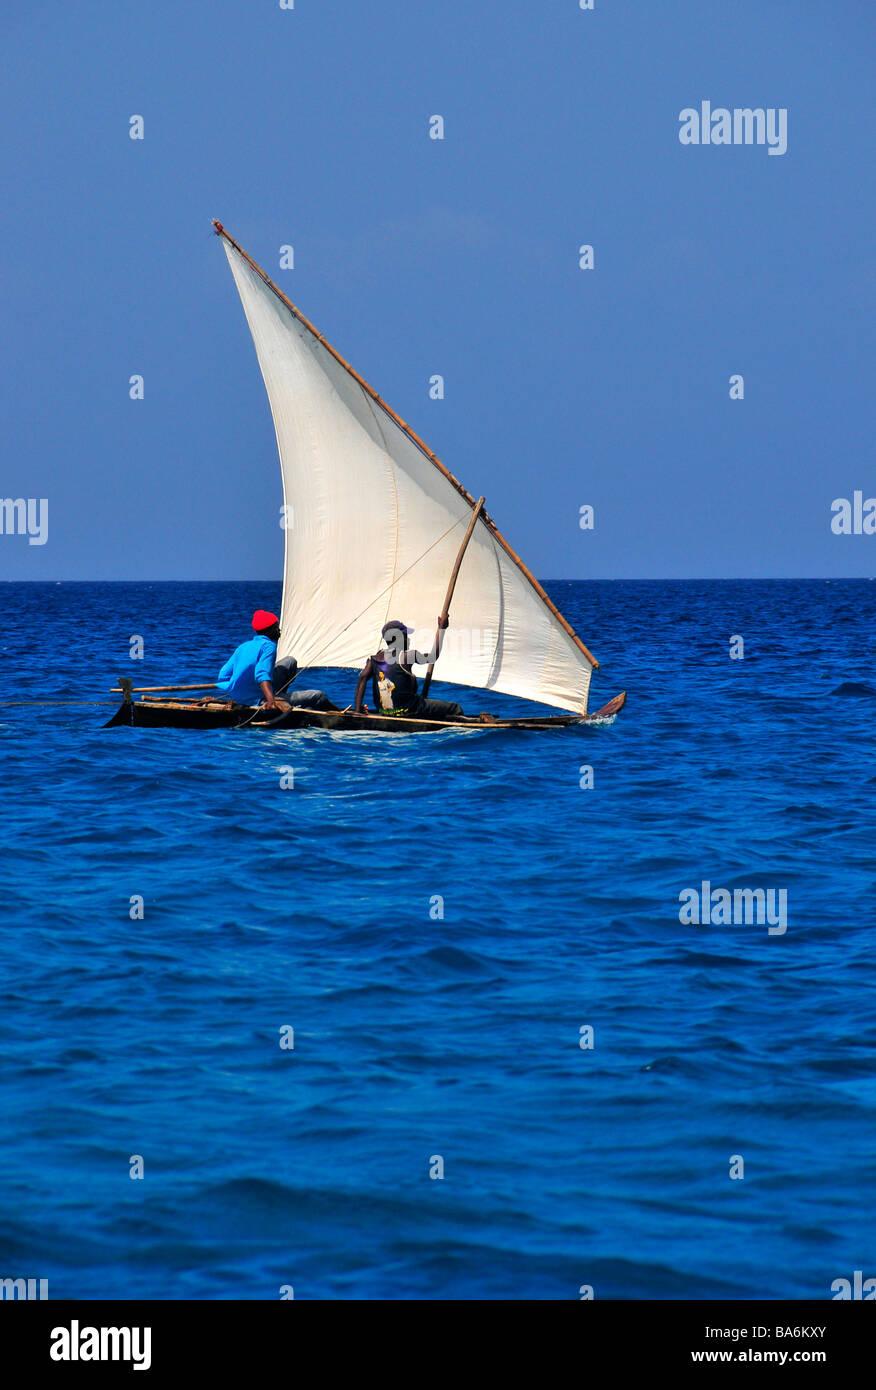 Traditional Fishermen in Dhow fishing boat,Indian ocean,Zanzibar,Tanzania, - Stock Image